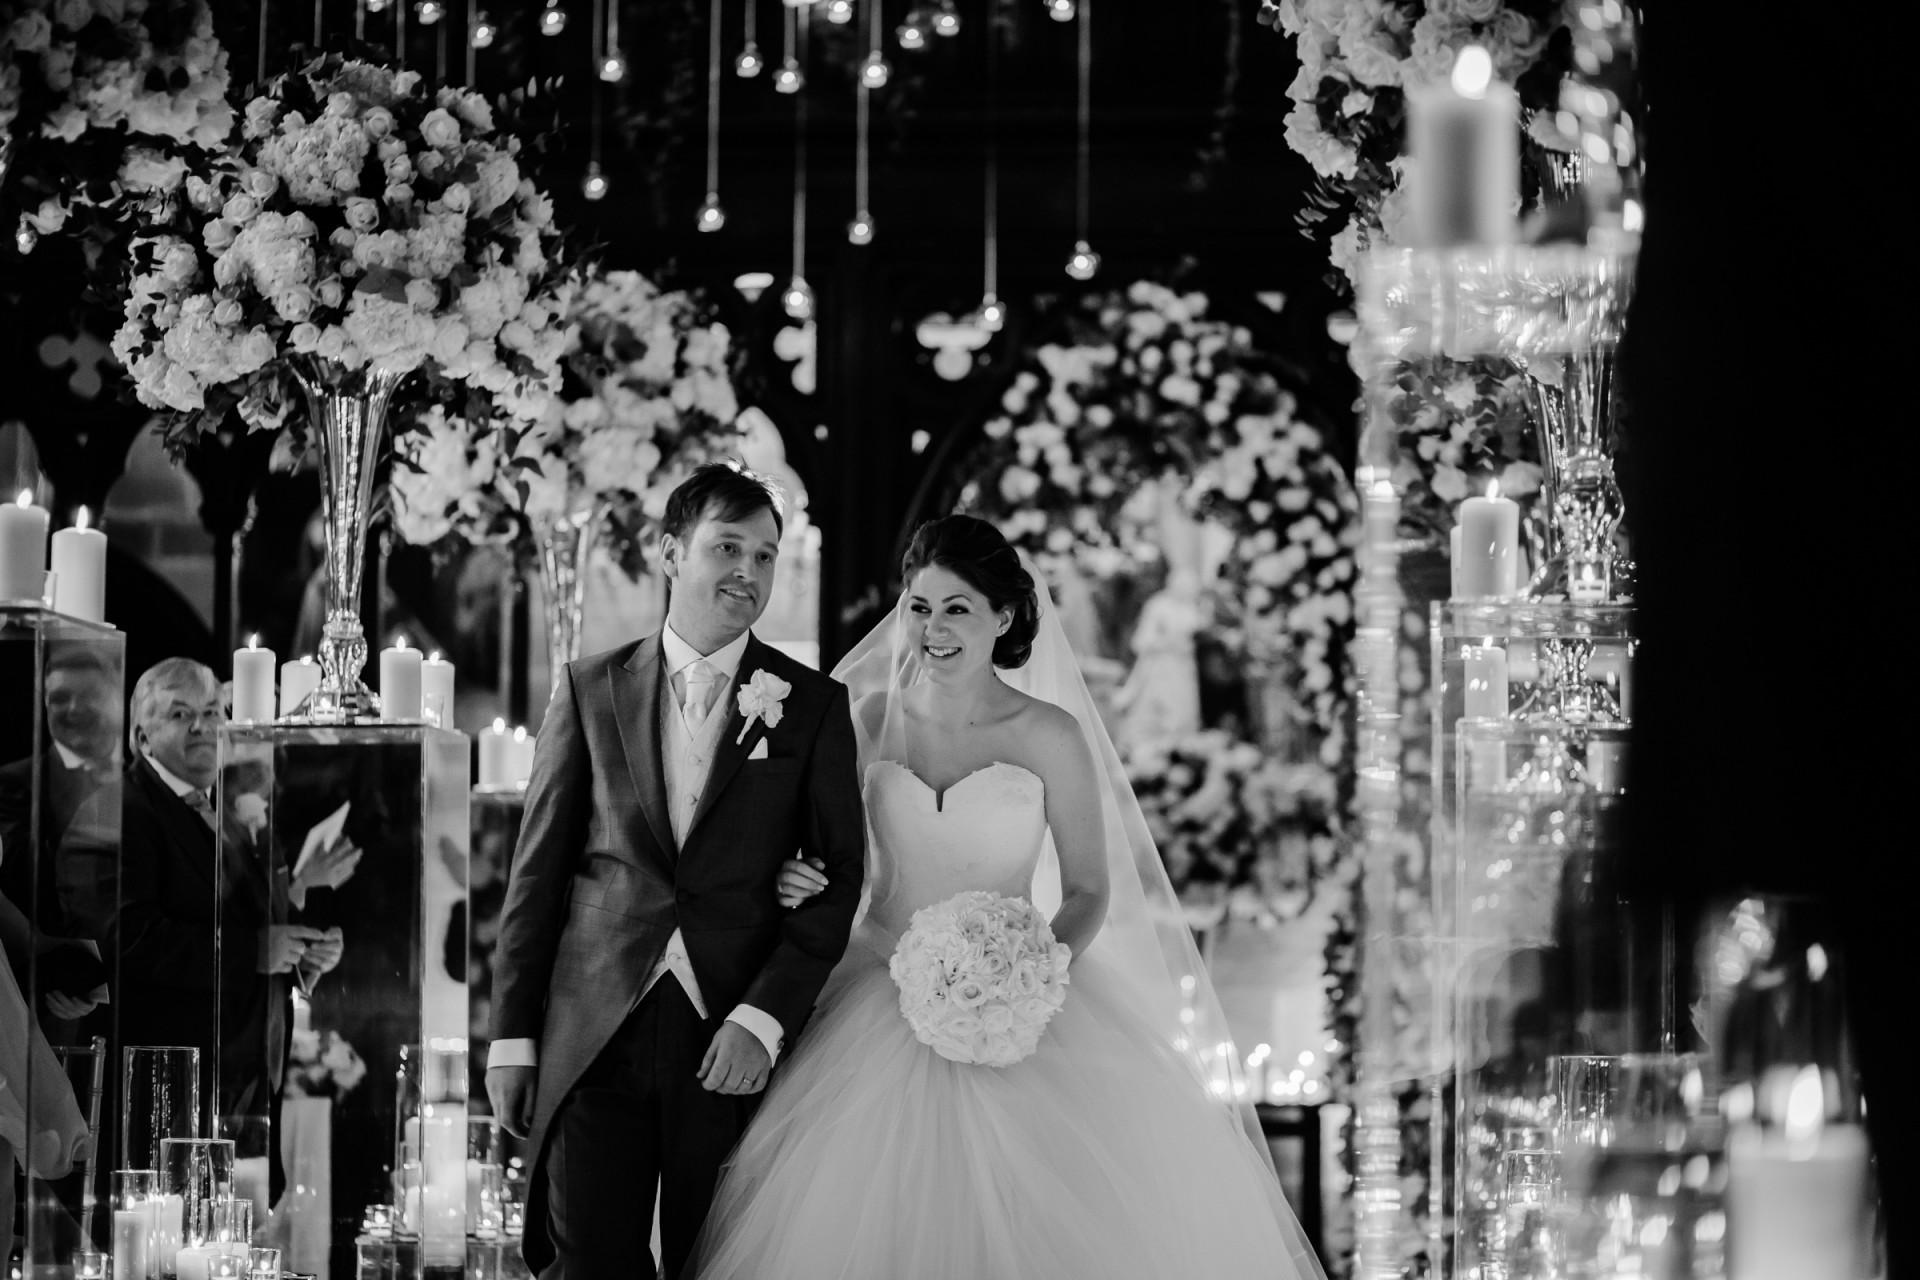 Katie-Joe_Sansom-Photography_New-Years-Eve-Wedding_025